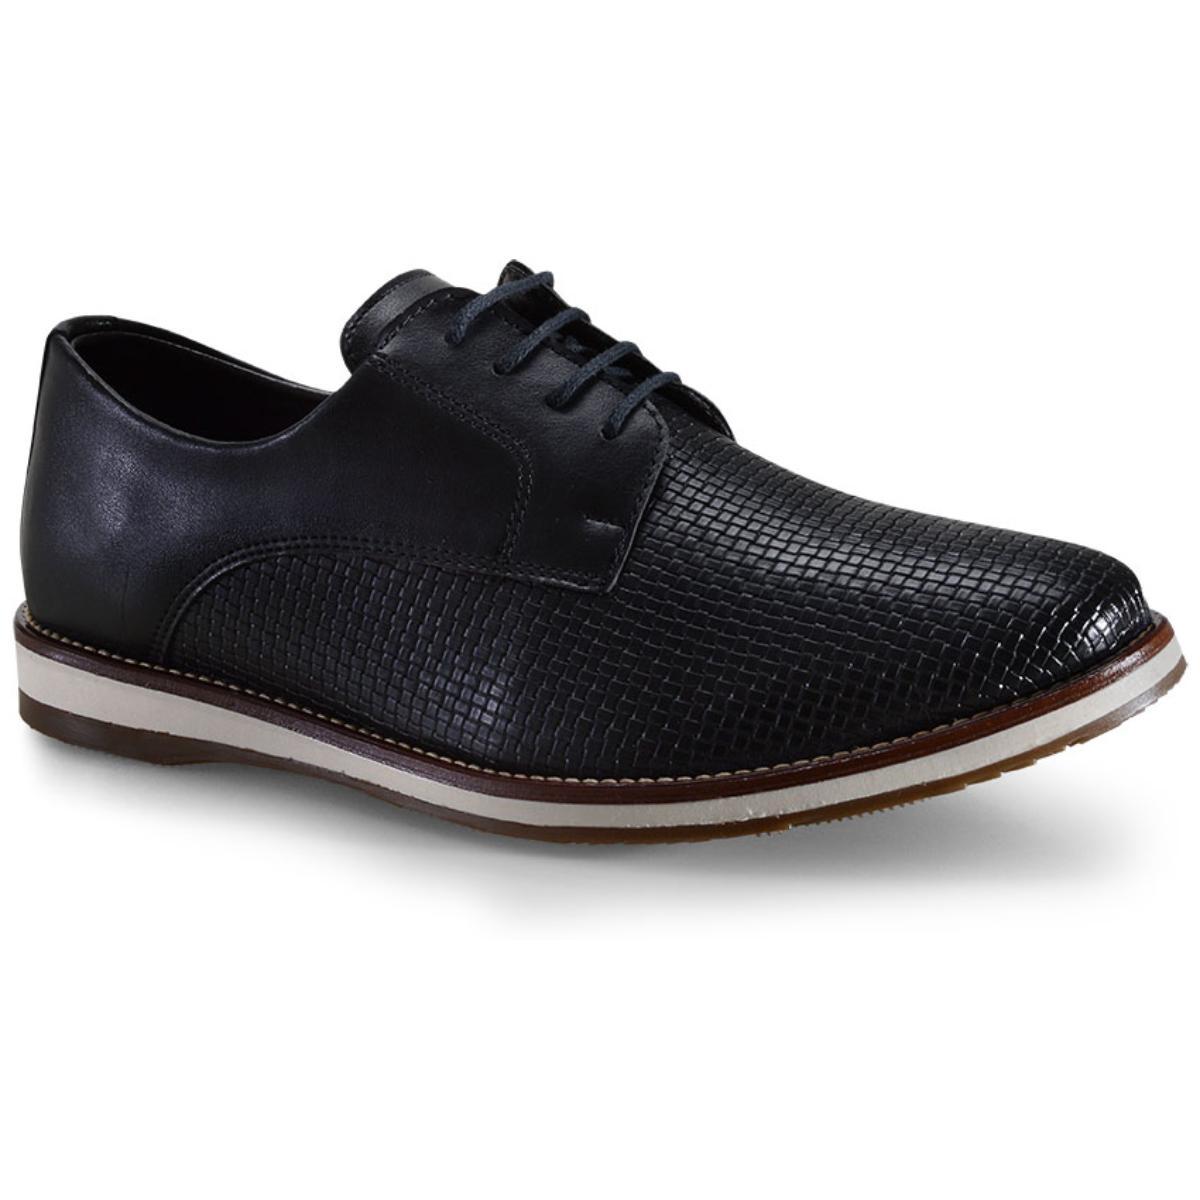 Sapato Masculino Ped Shoes Pa-503k-0345 Preto Kit Cinto+meia